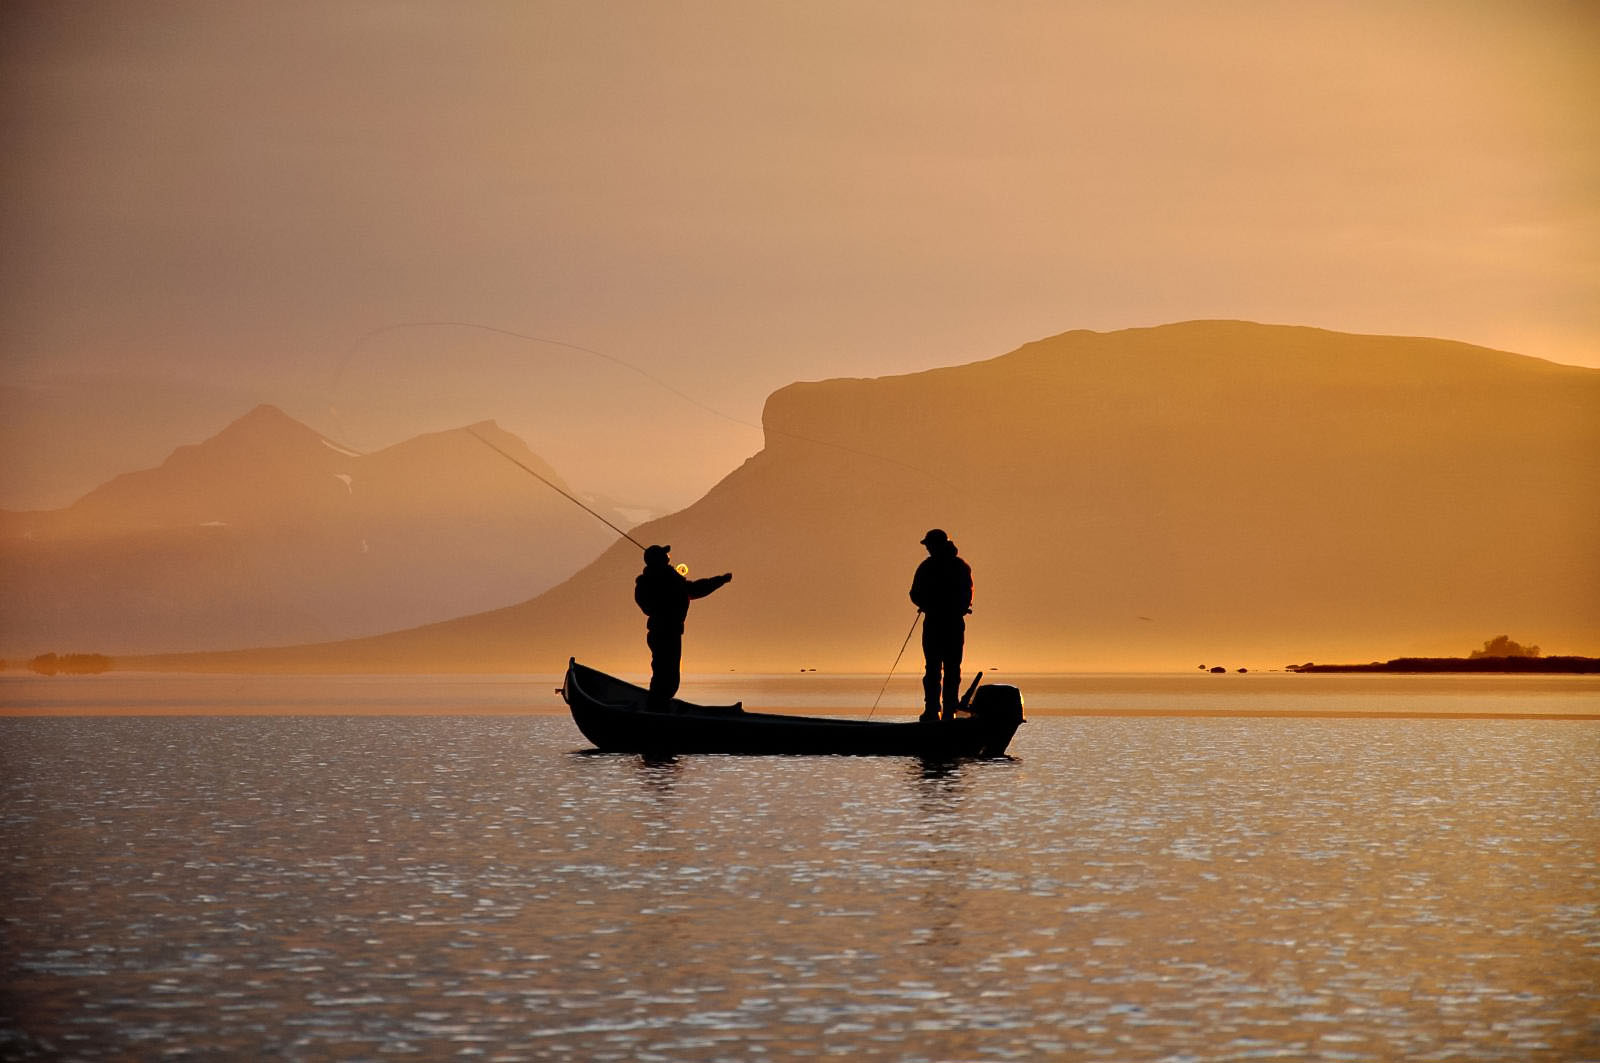 Fish Your Dream Fiske i solnedgången